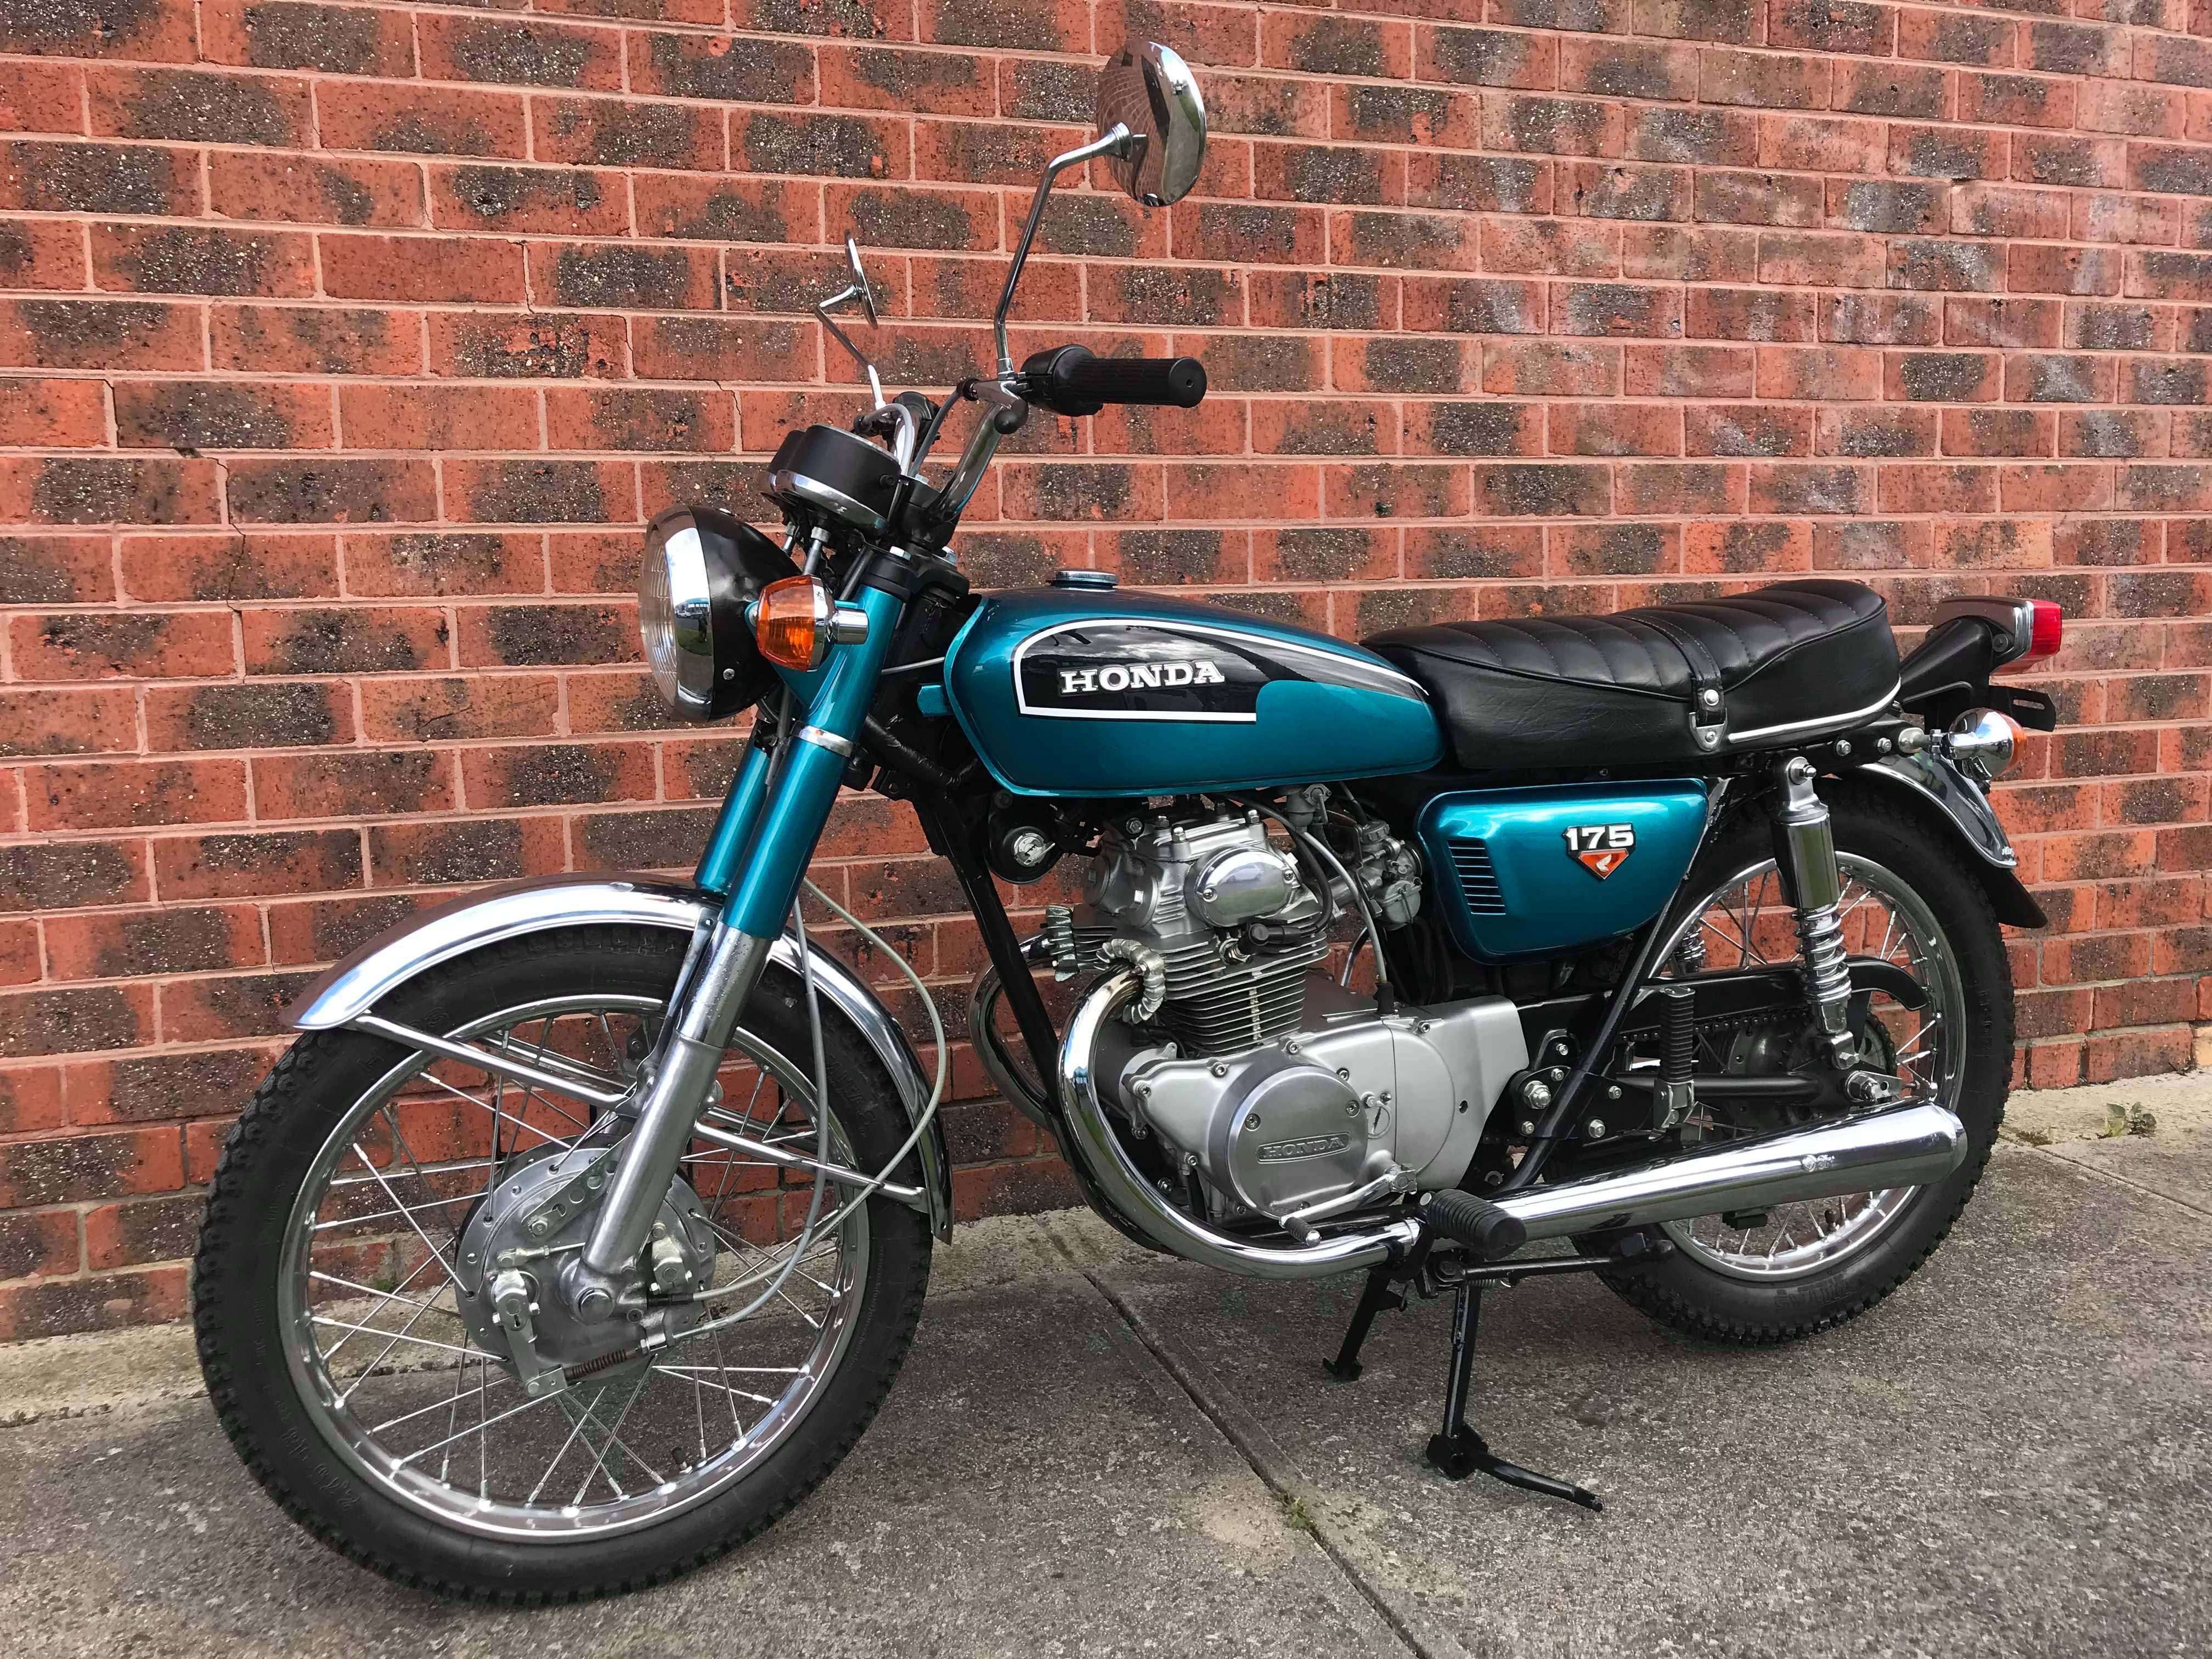 1973 Honda Cb175 175 Road - Jbw5041814